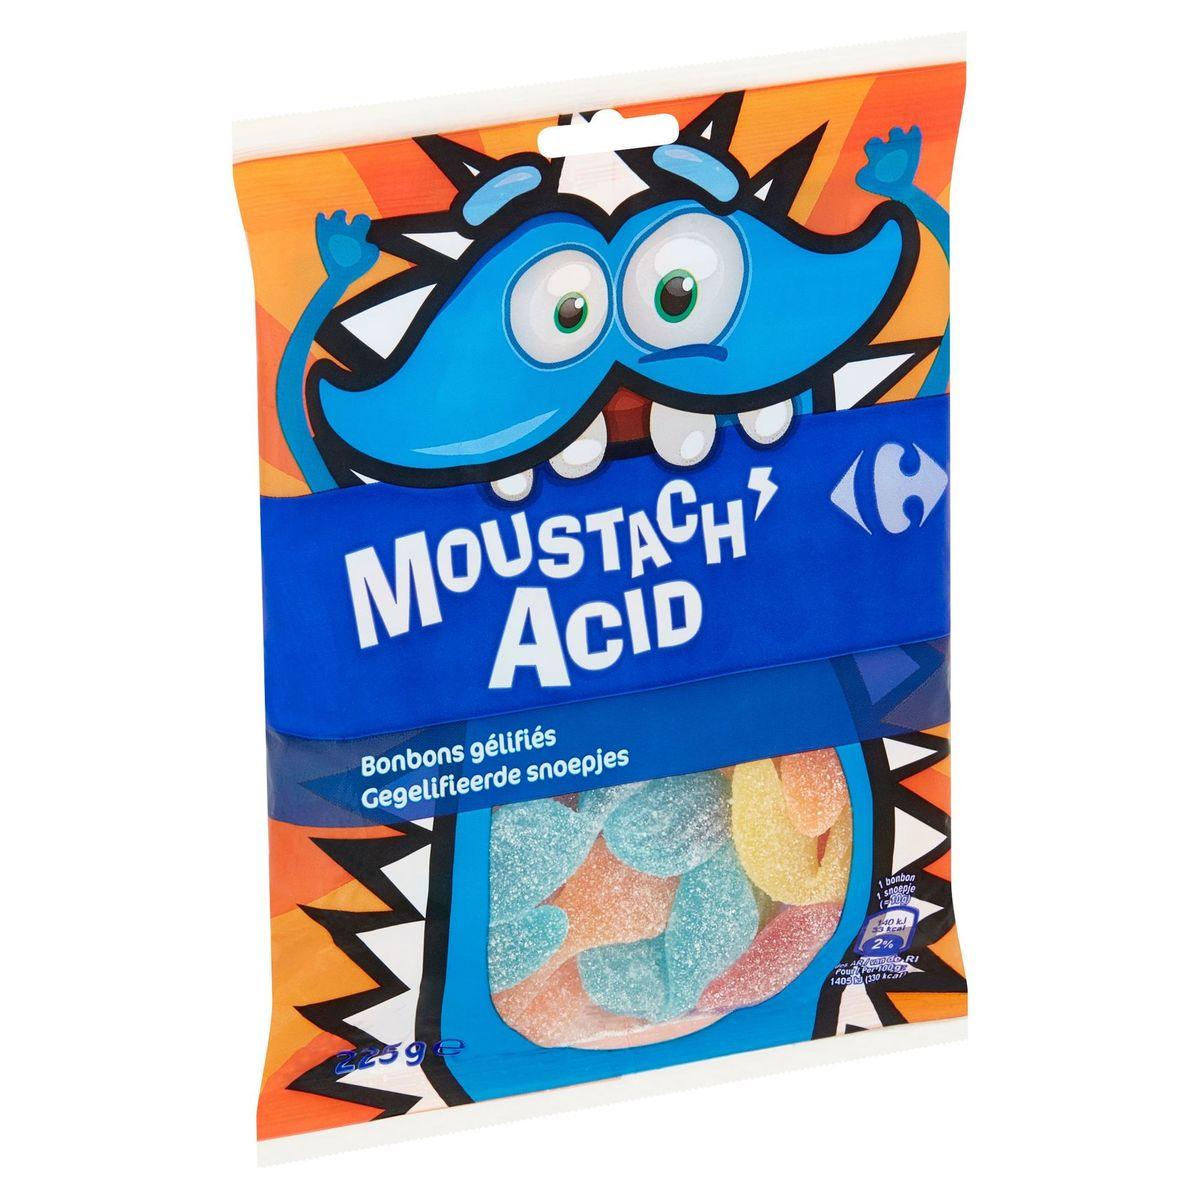 Carrefour Moustach Acid Gegelifieerde Snoepjes 225 g